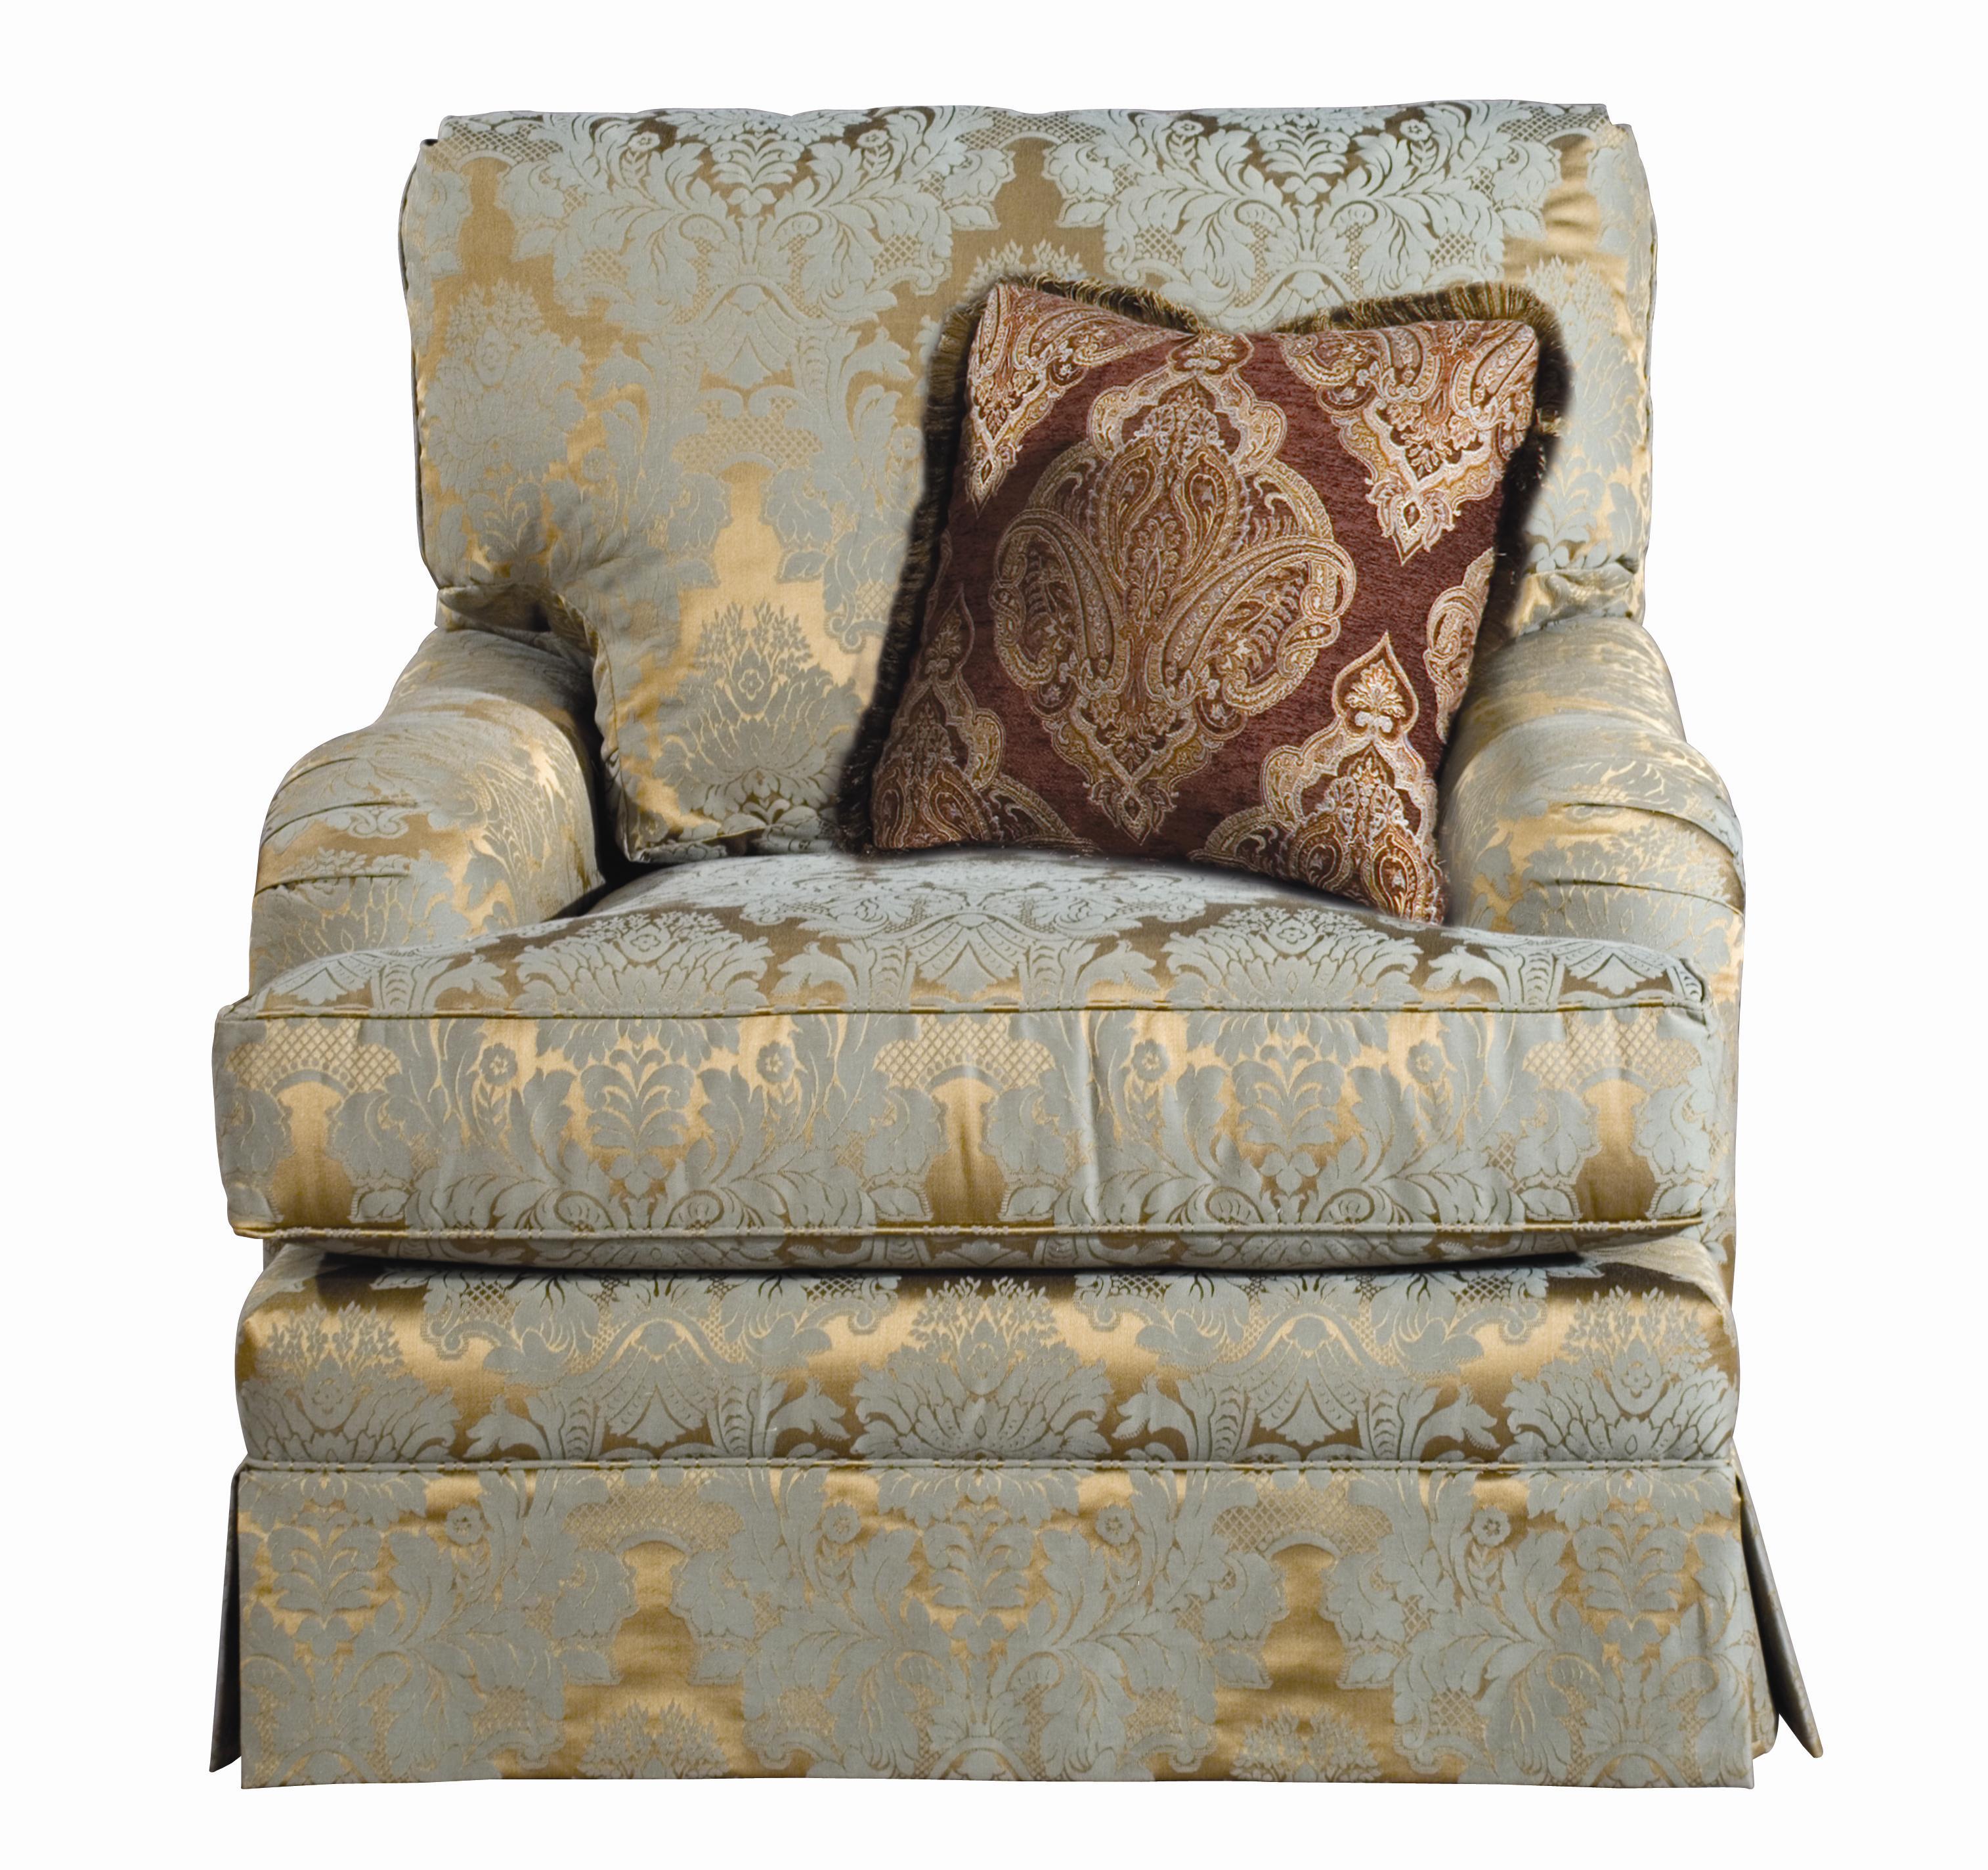 Gentil Kincaid Furniture Custom Select UpholsteryCustom Upholstered Chair ...